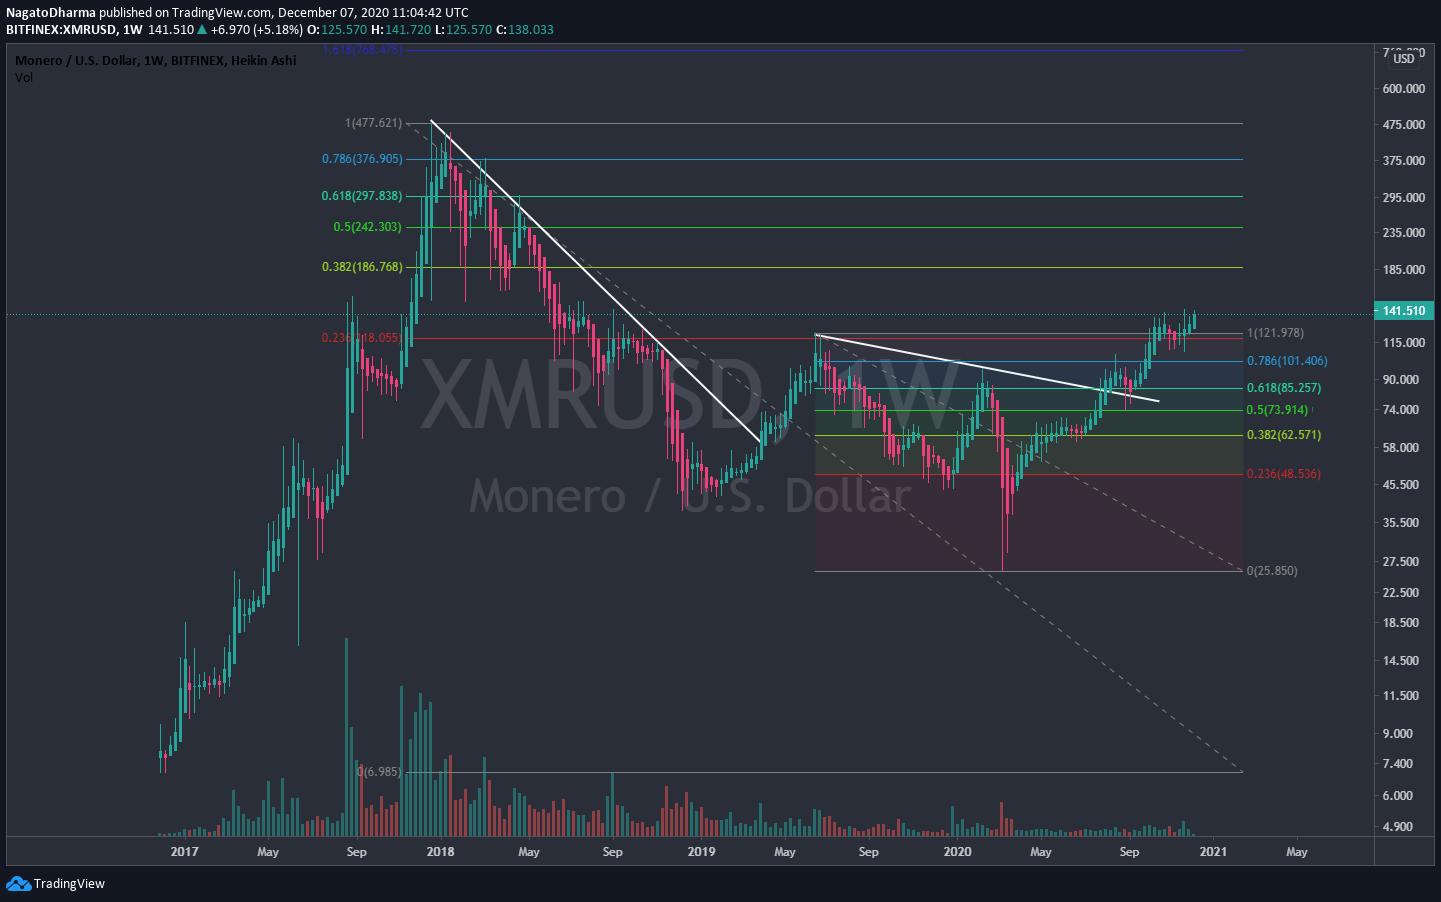 XMR Long-Term movement